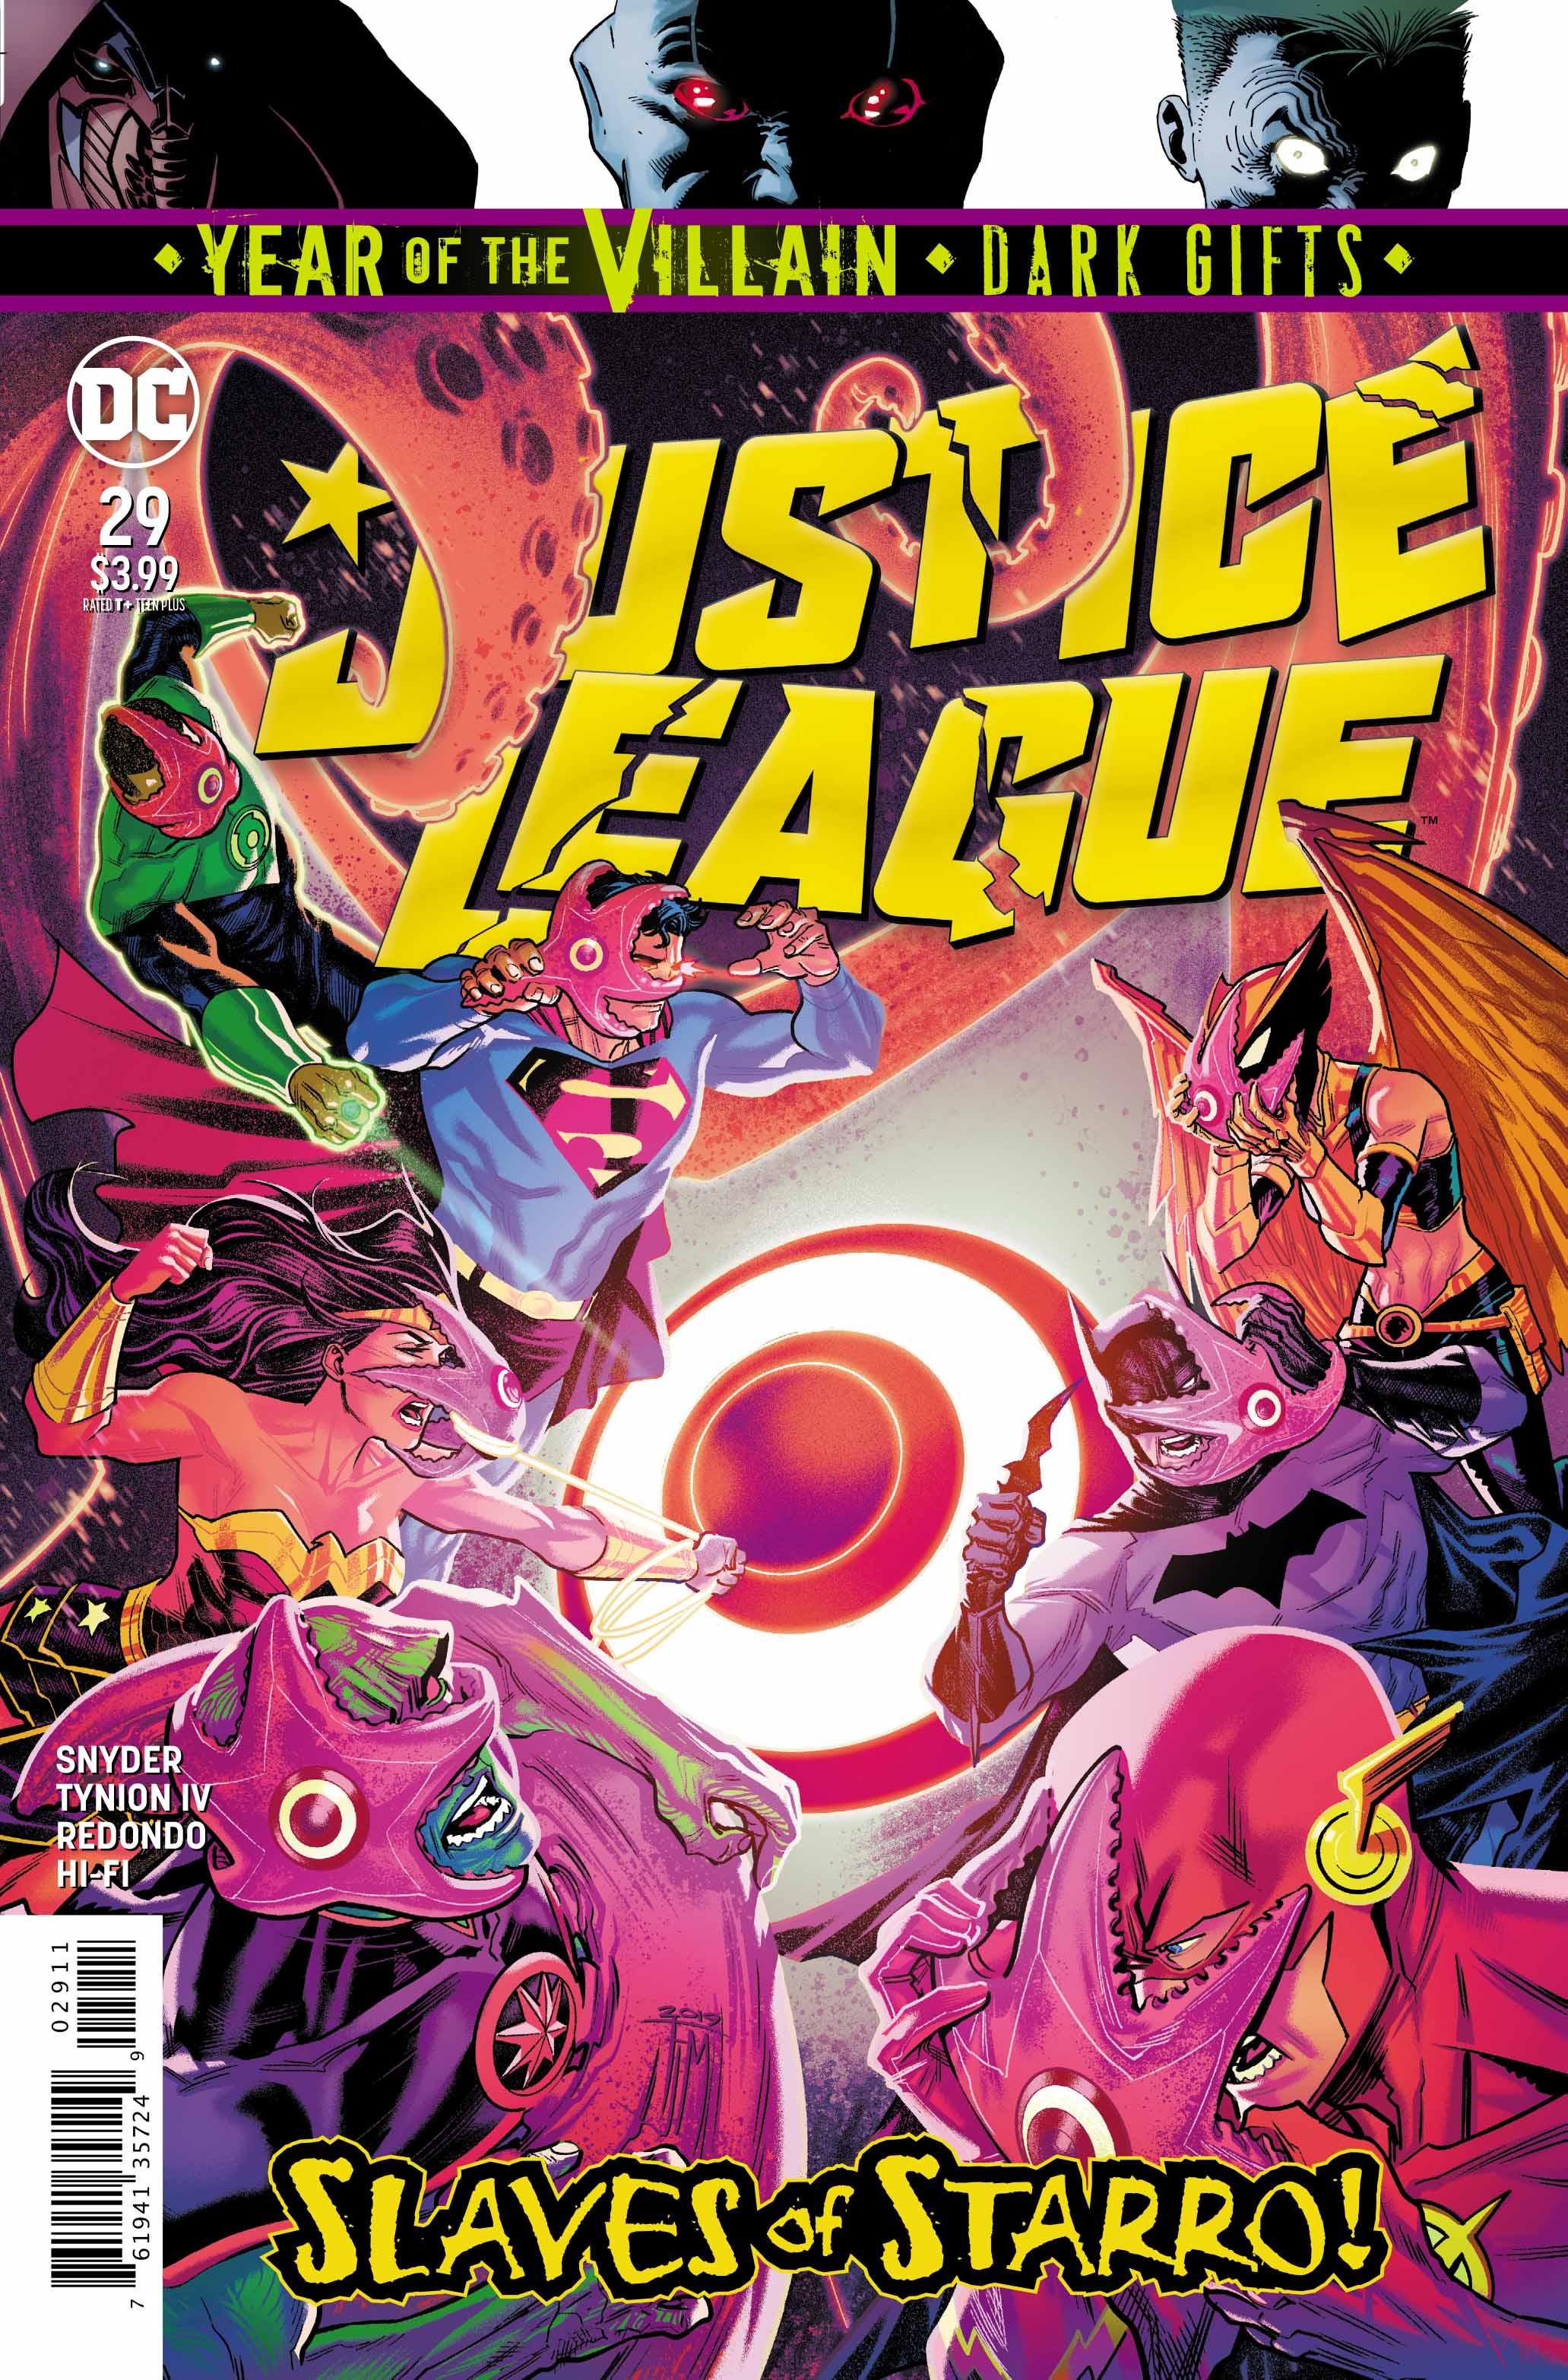 1ST PRINTING RACHEL+TERRY DODSON VARIANT COVER YOTV DC 2019 JUSTICE LEAGUE #29